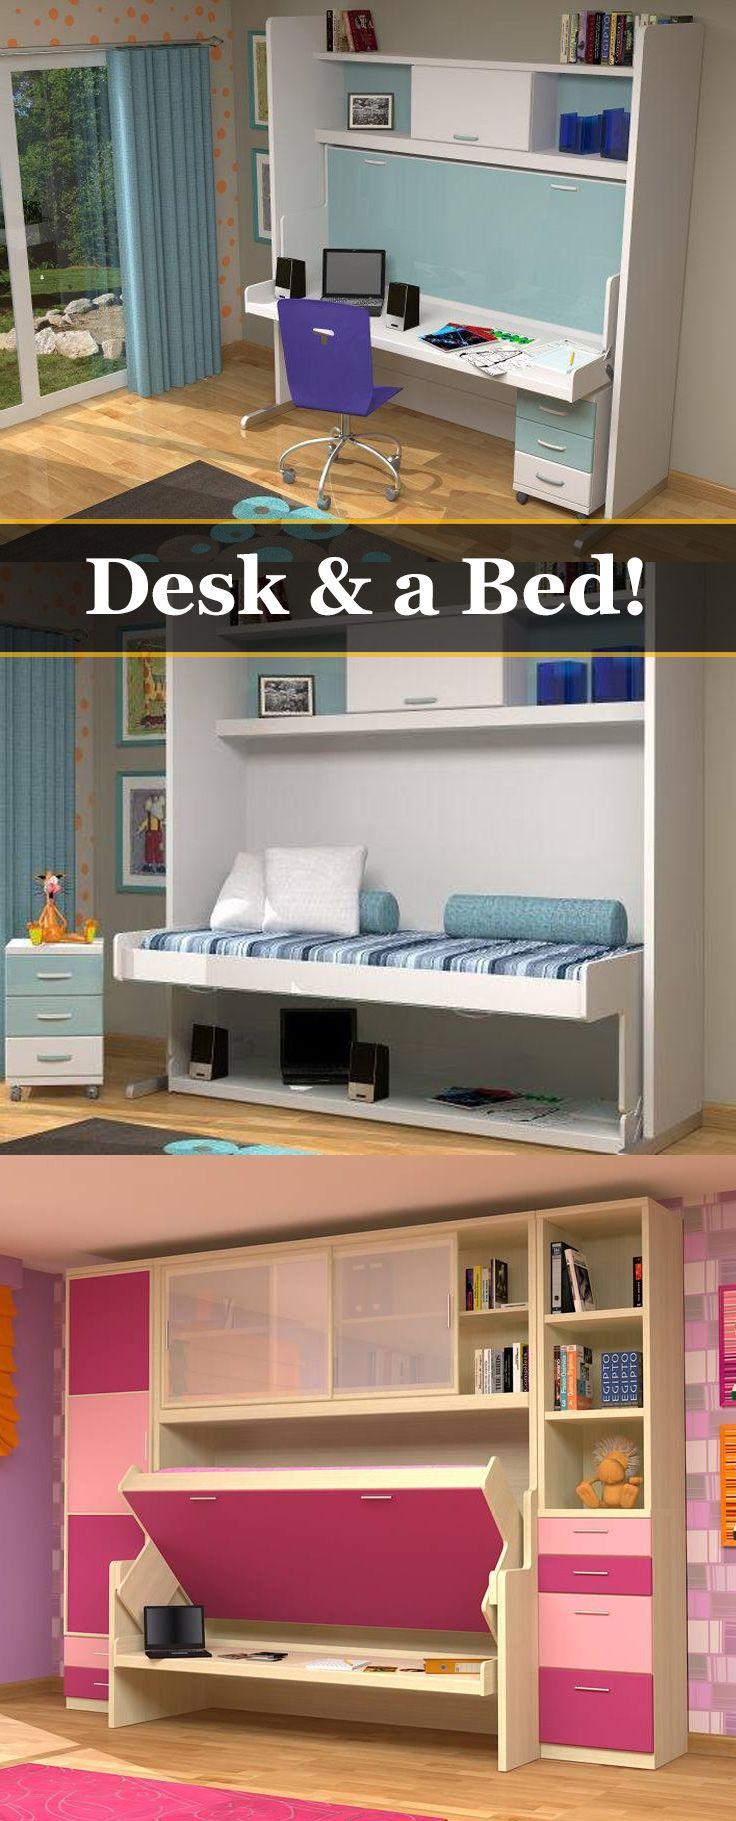 Best Hiddenbed® Fold Out Bed And Desk Mechanism Convertible 400 x 300